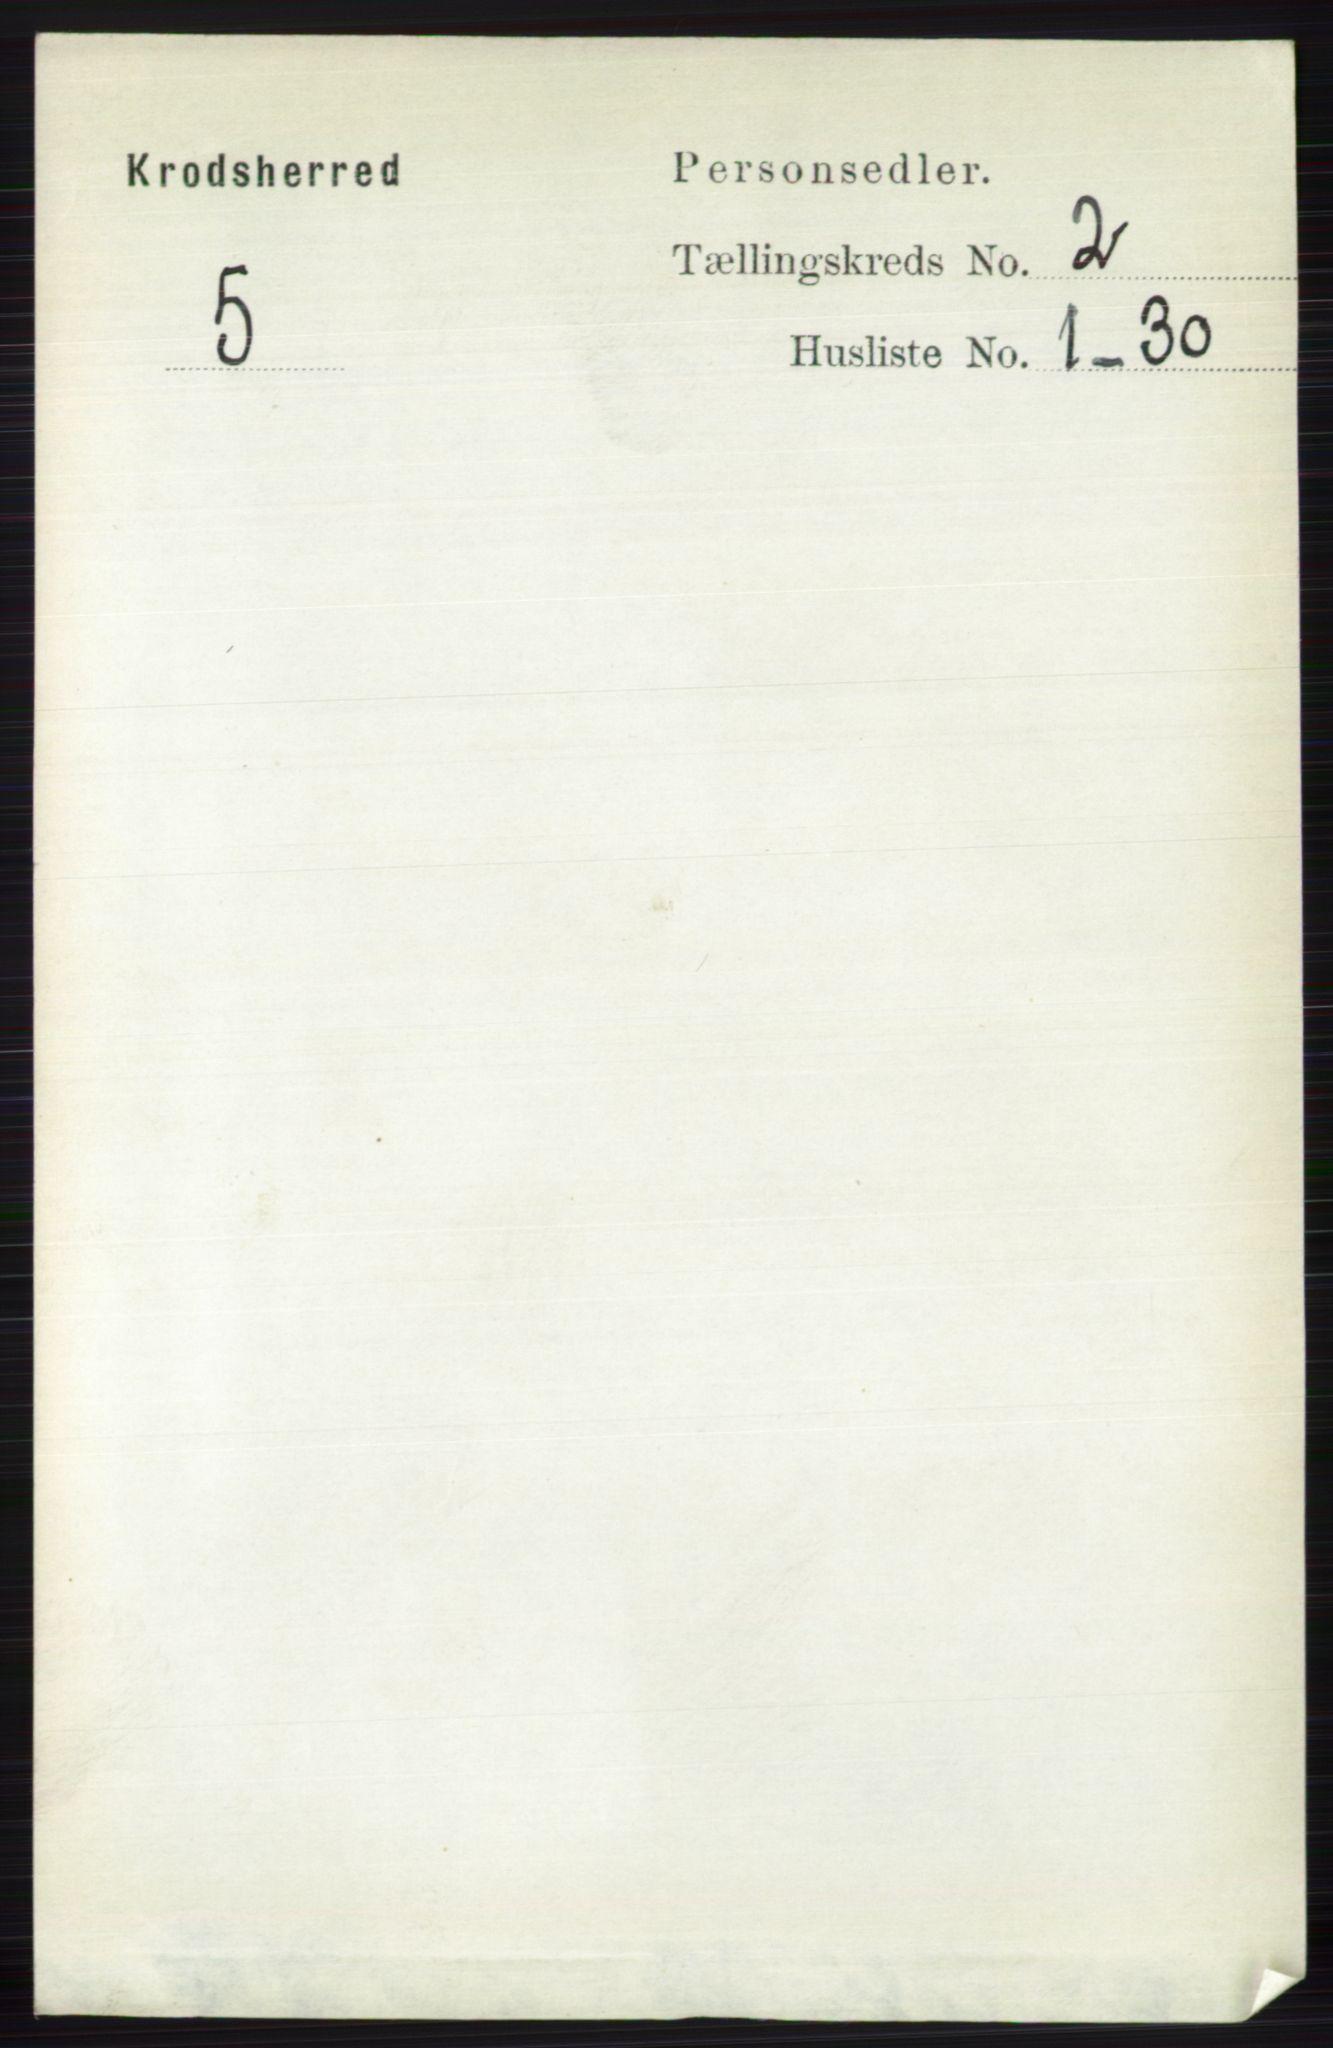 RA, Folketelling 1891 for 0621 Sigdal herred, 1891, s. 5315